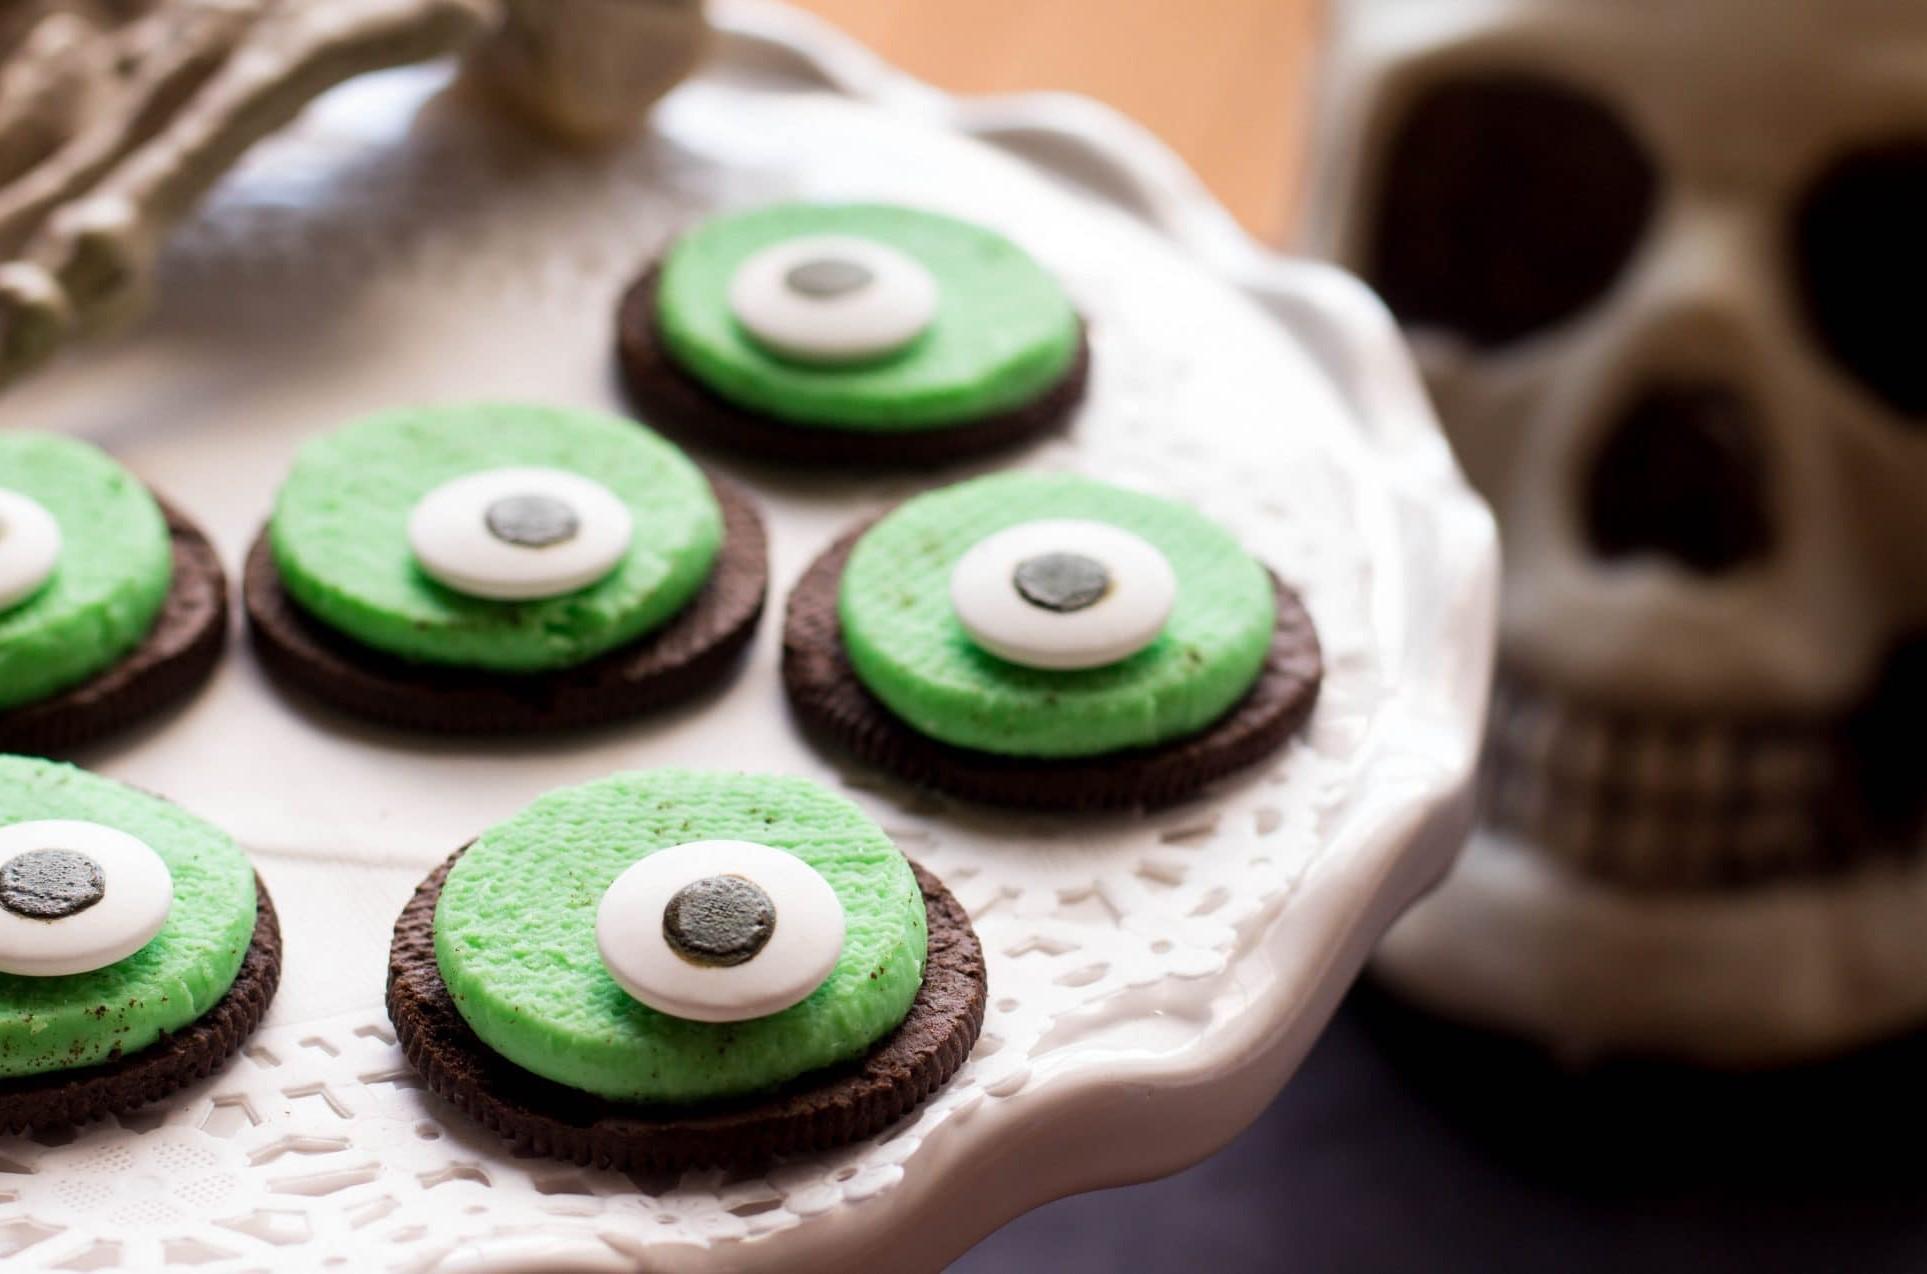 One-eyed cookies | 15 Easy Halloween Cookie Ideas | Her Beauty